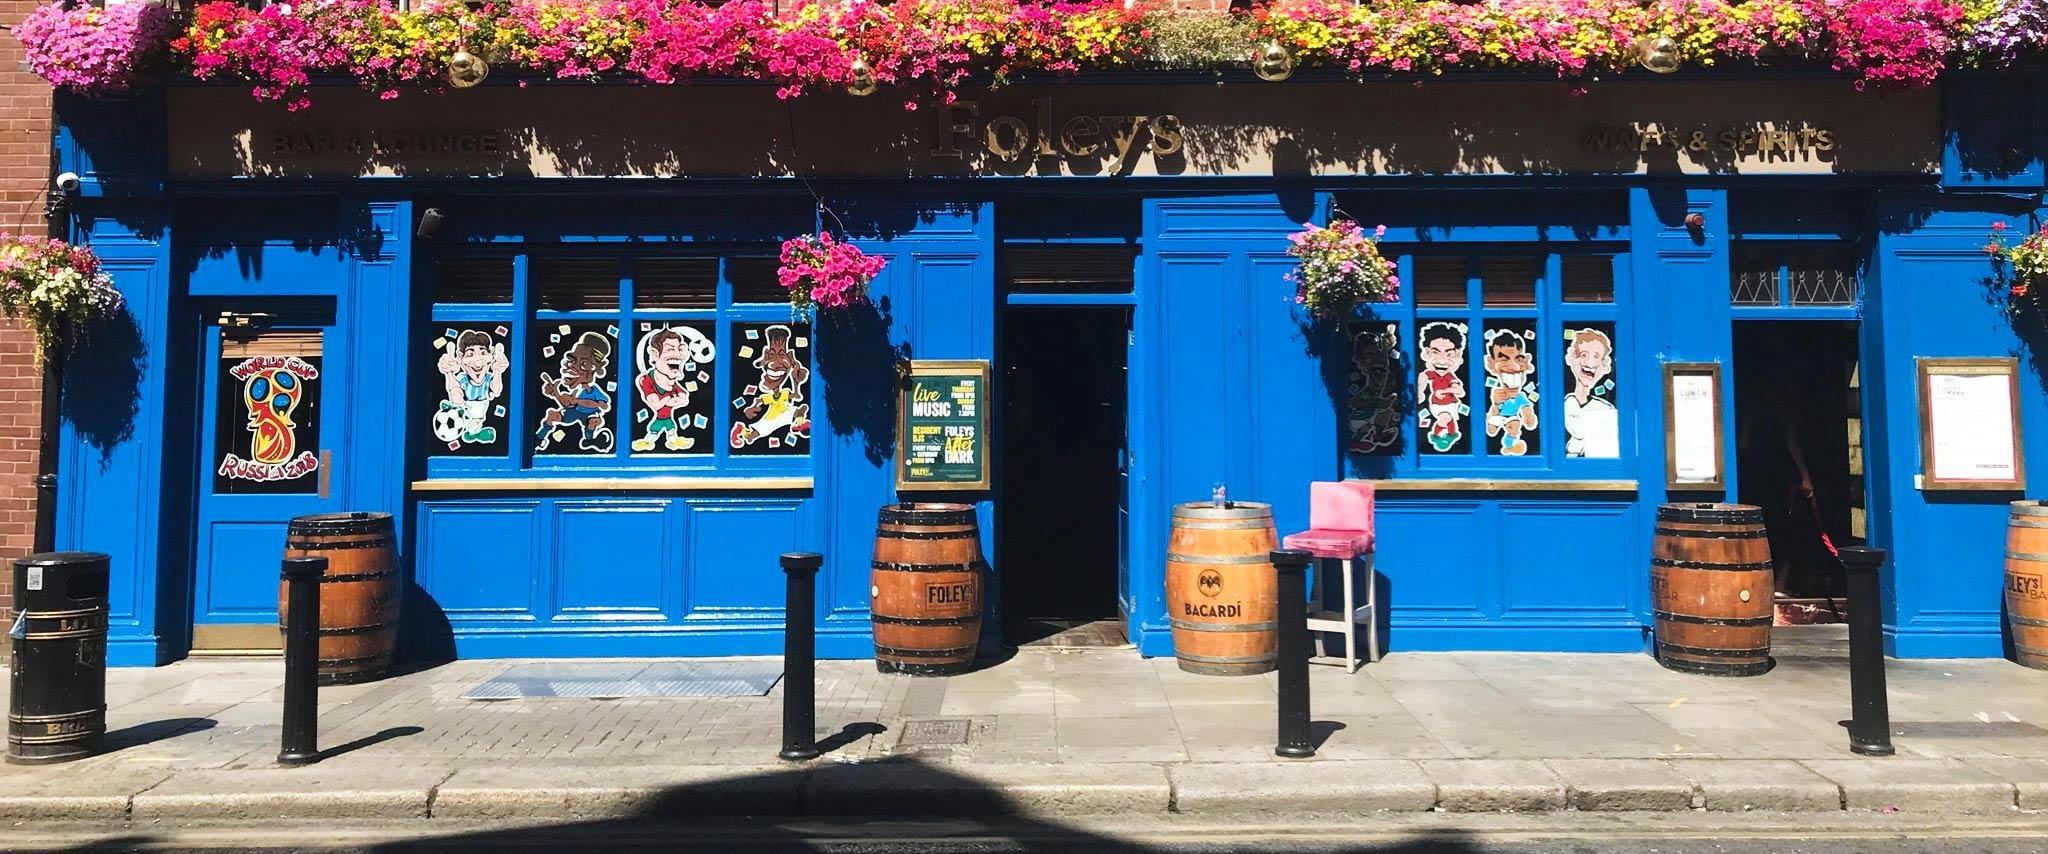 Foley's Bar & Restaurant